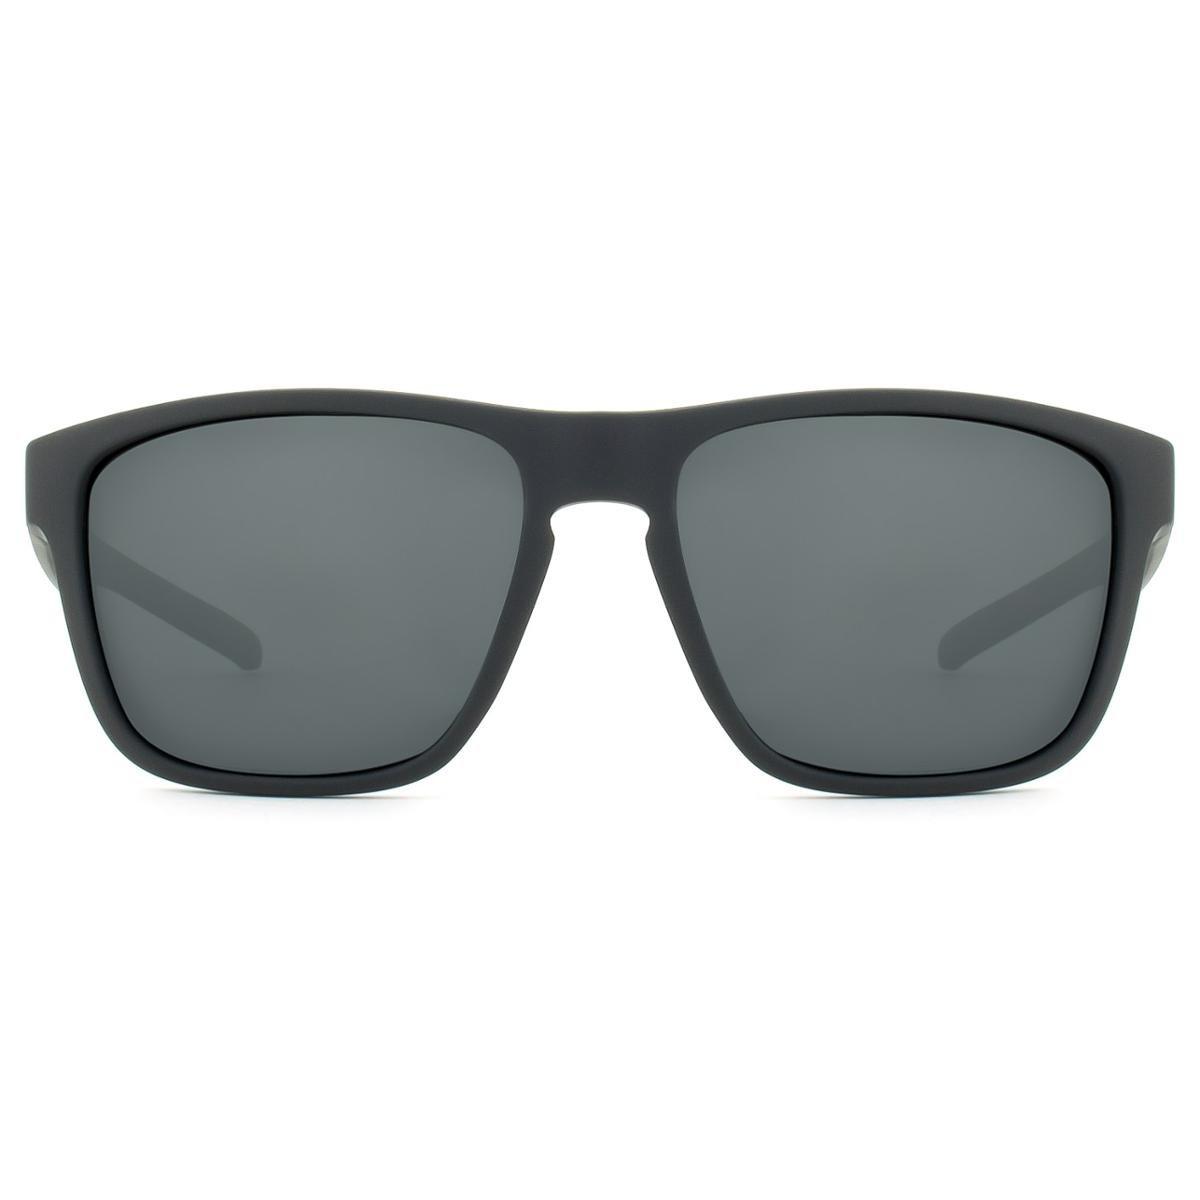 Óculos HB H-Bomb 90112 Polarizado 00125 - Compre Agora   Netshoes 5c3e769b41